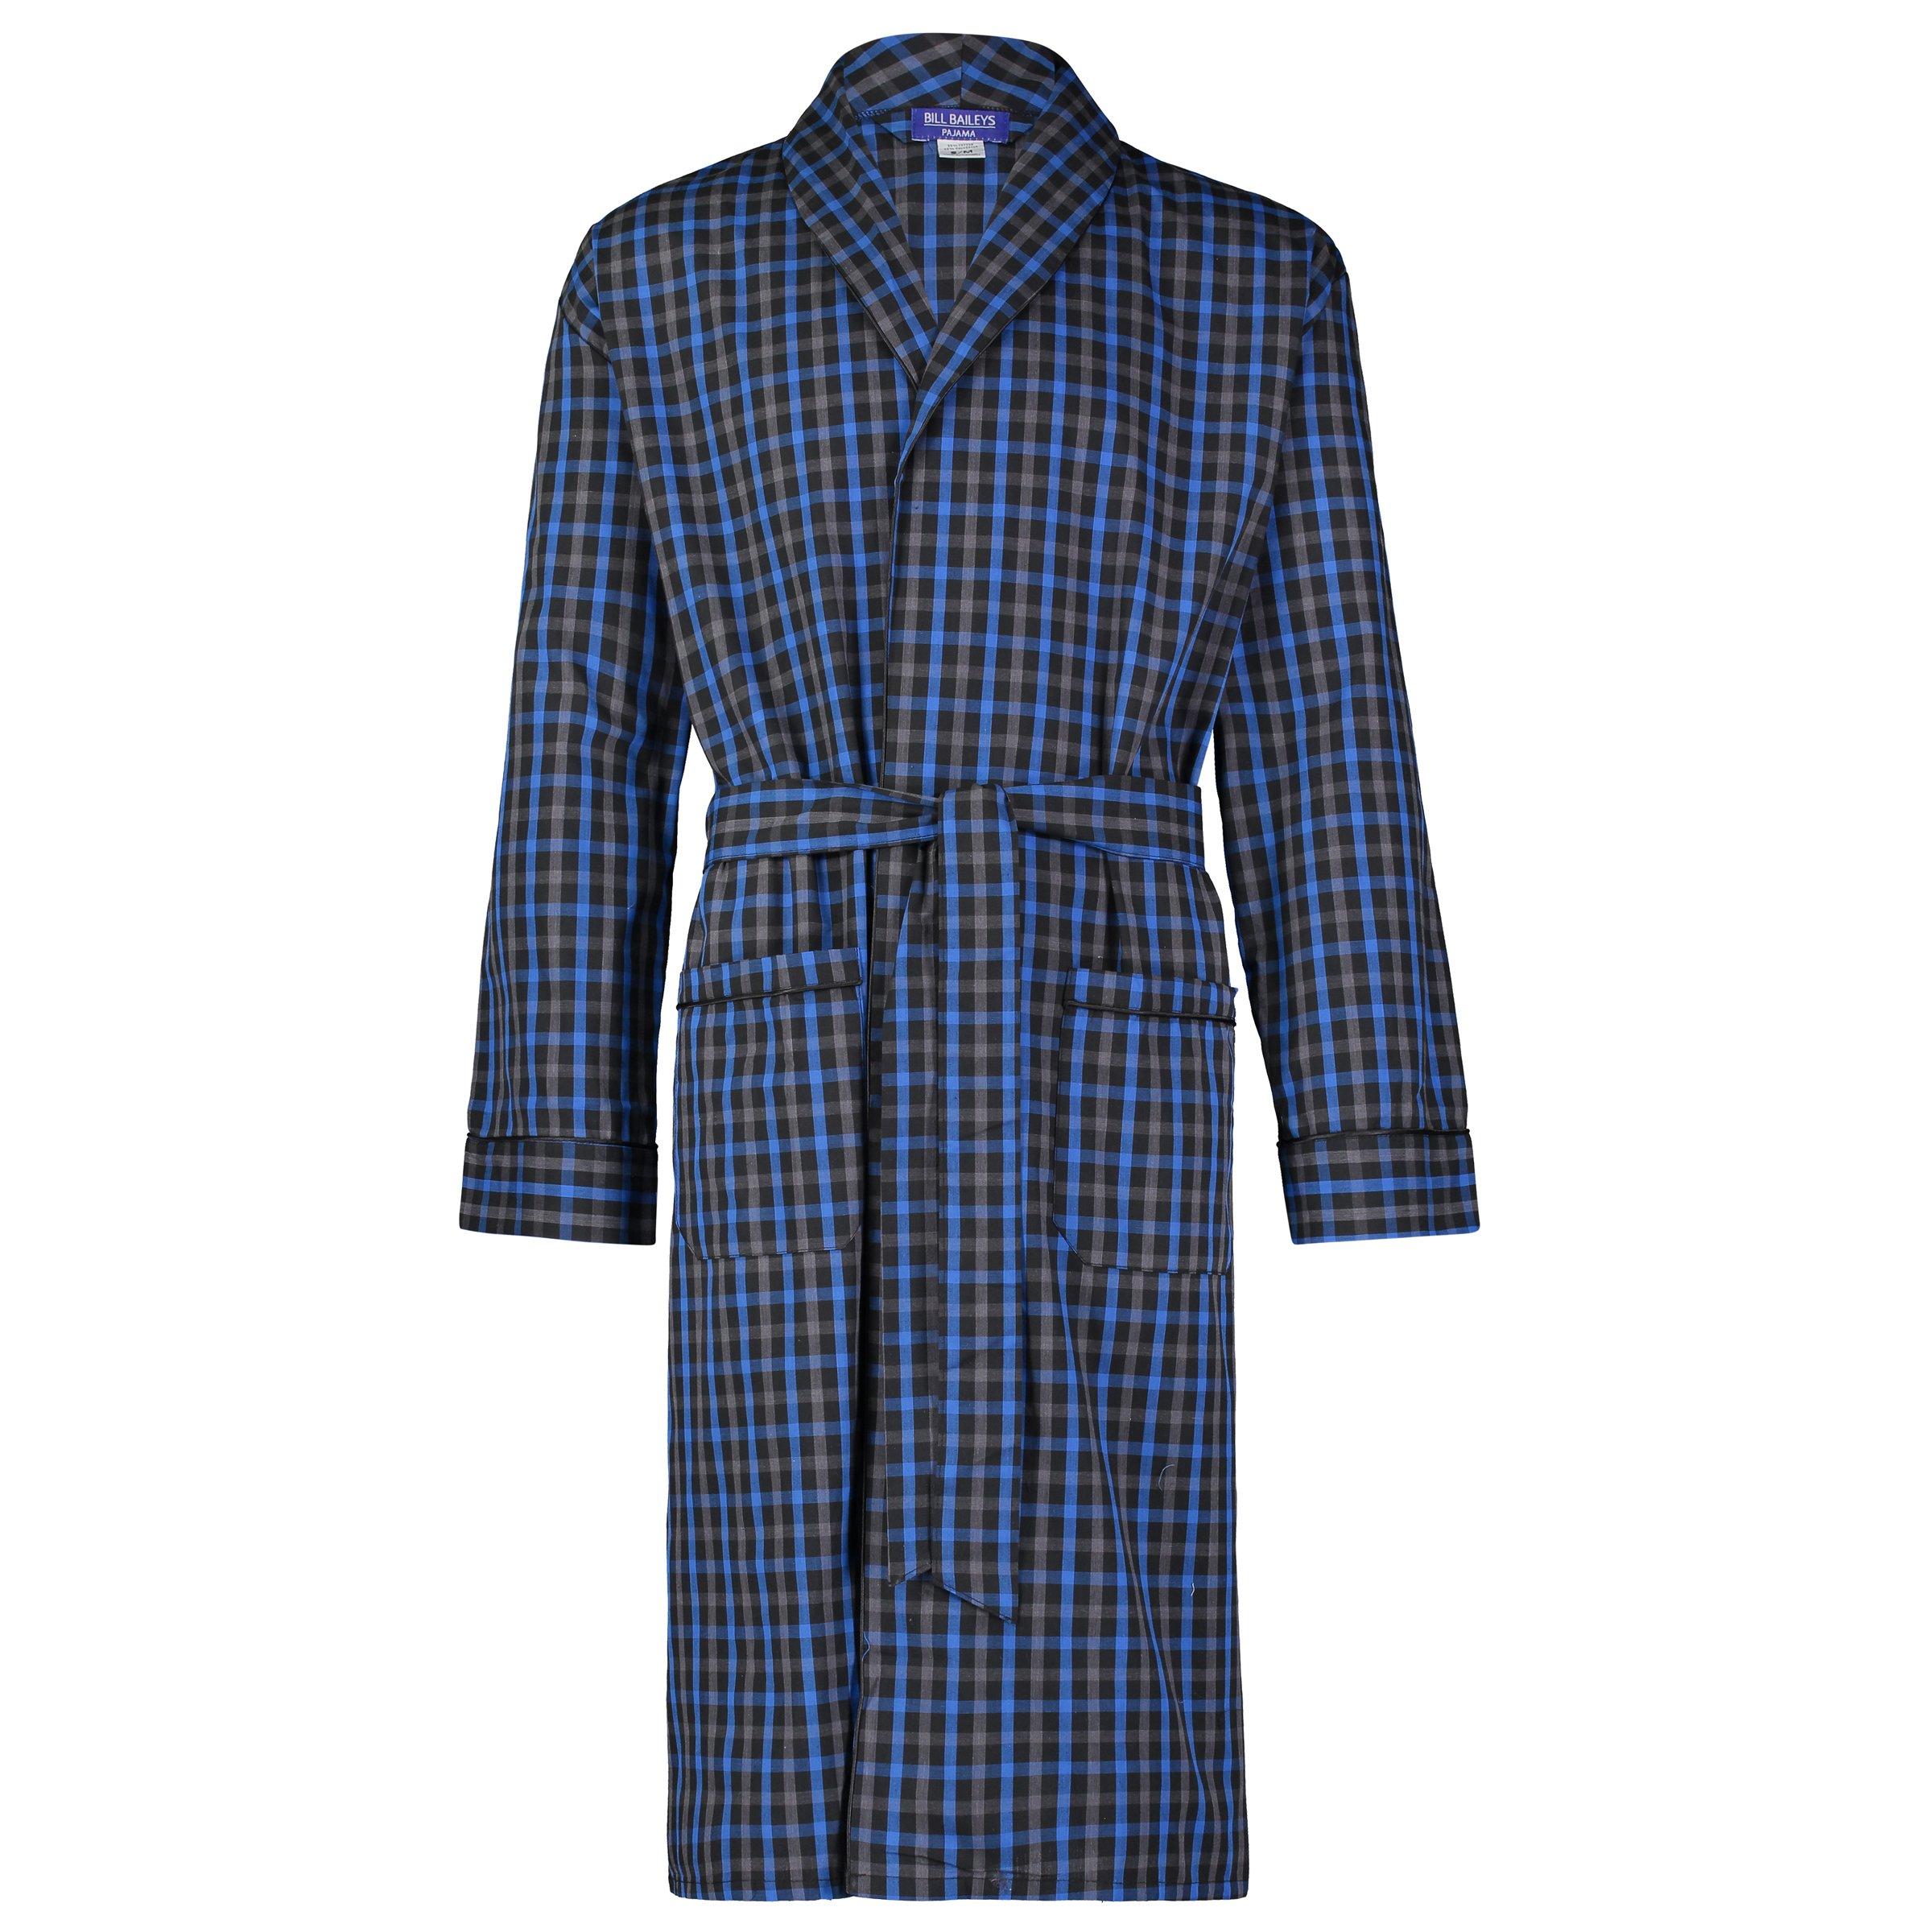 Bill Baileys Men's Long Sleeve Premium Cotton Blend Woven Robe Lightweight Sleep & Morning Robe (Large/X-Large, Black-Blue)